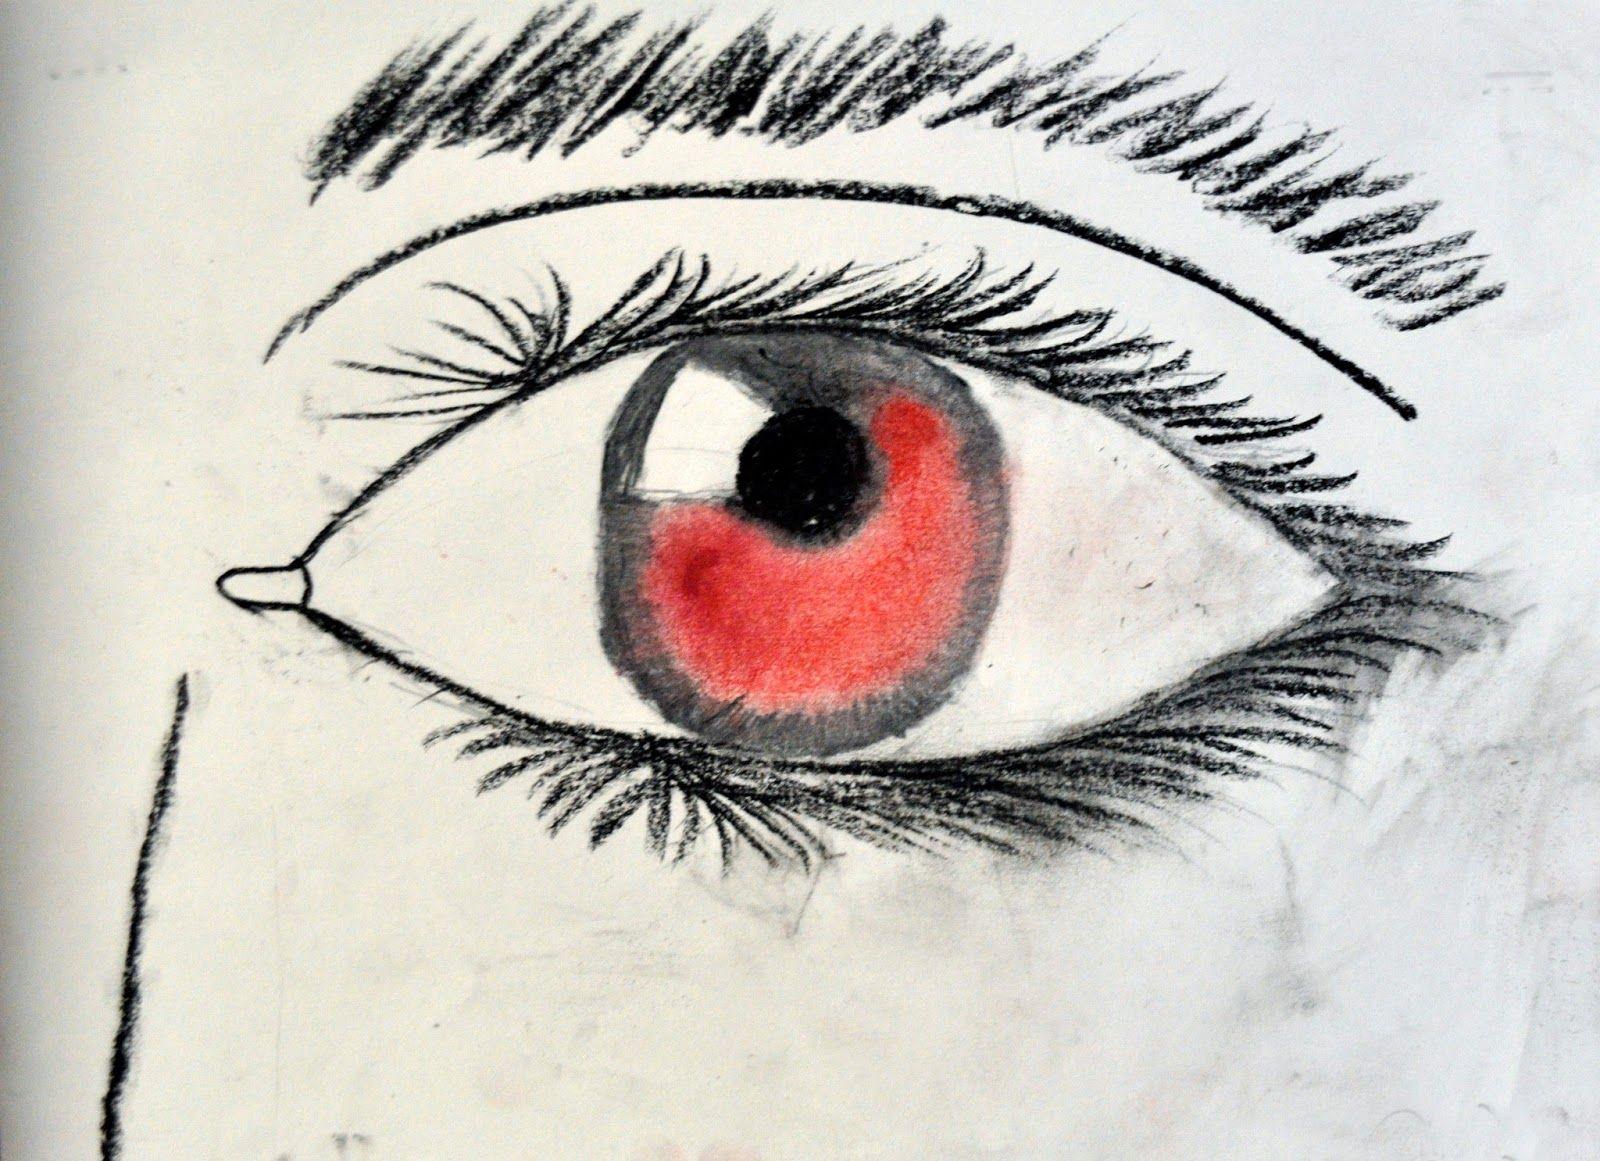 Artisan Des Arts Eye Study Grade 5 6 Eye Study Art Lessons Middle School 6th Grade Art